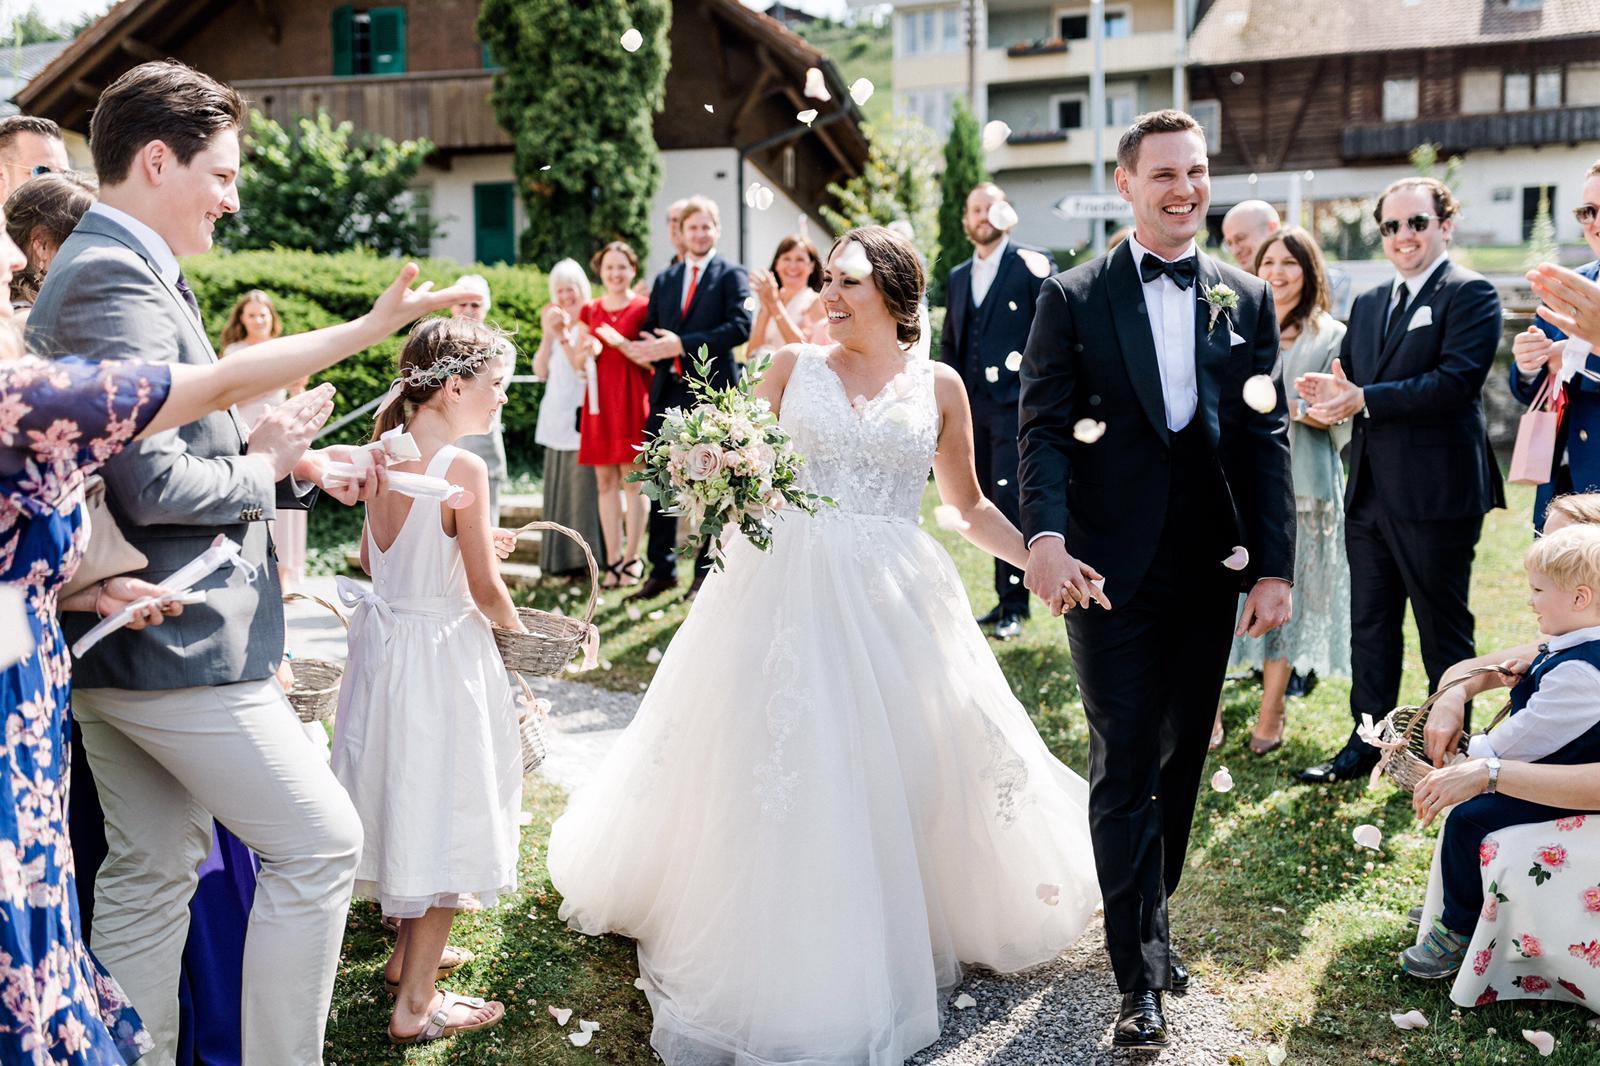 laura+bride+bespoke+customised+wedding+dress+ccm.jpeg